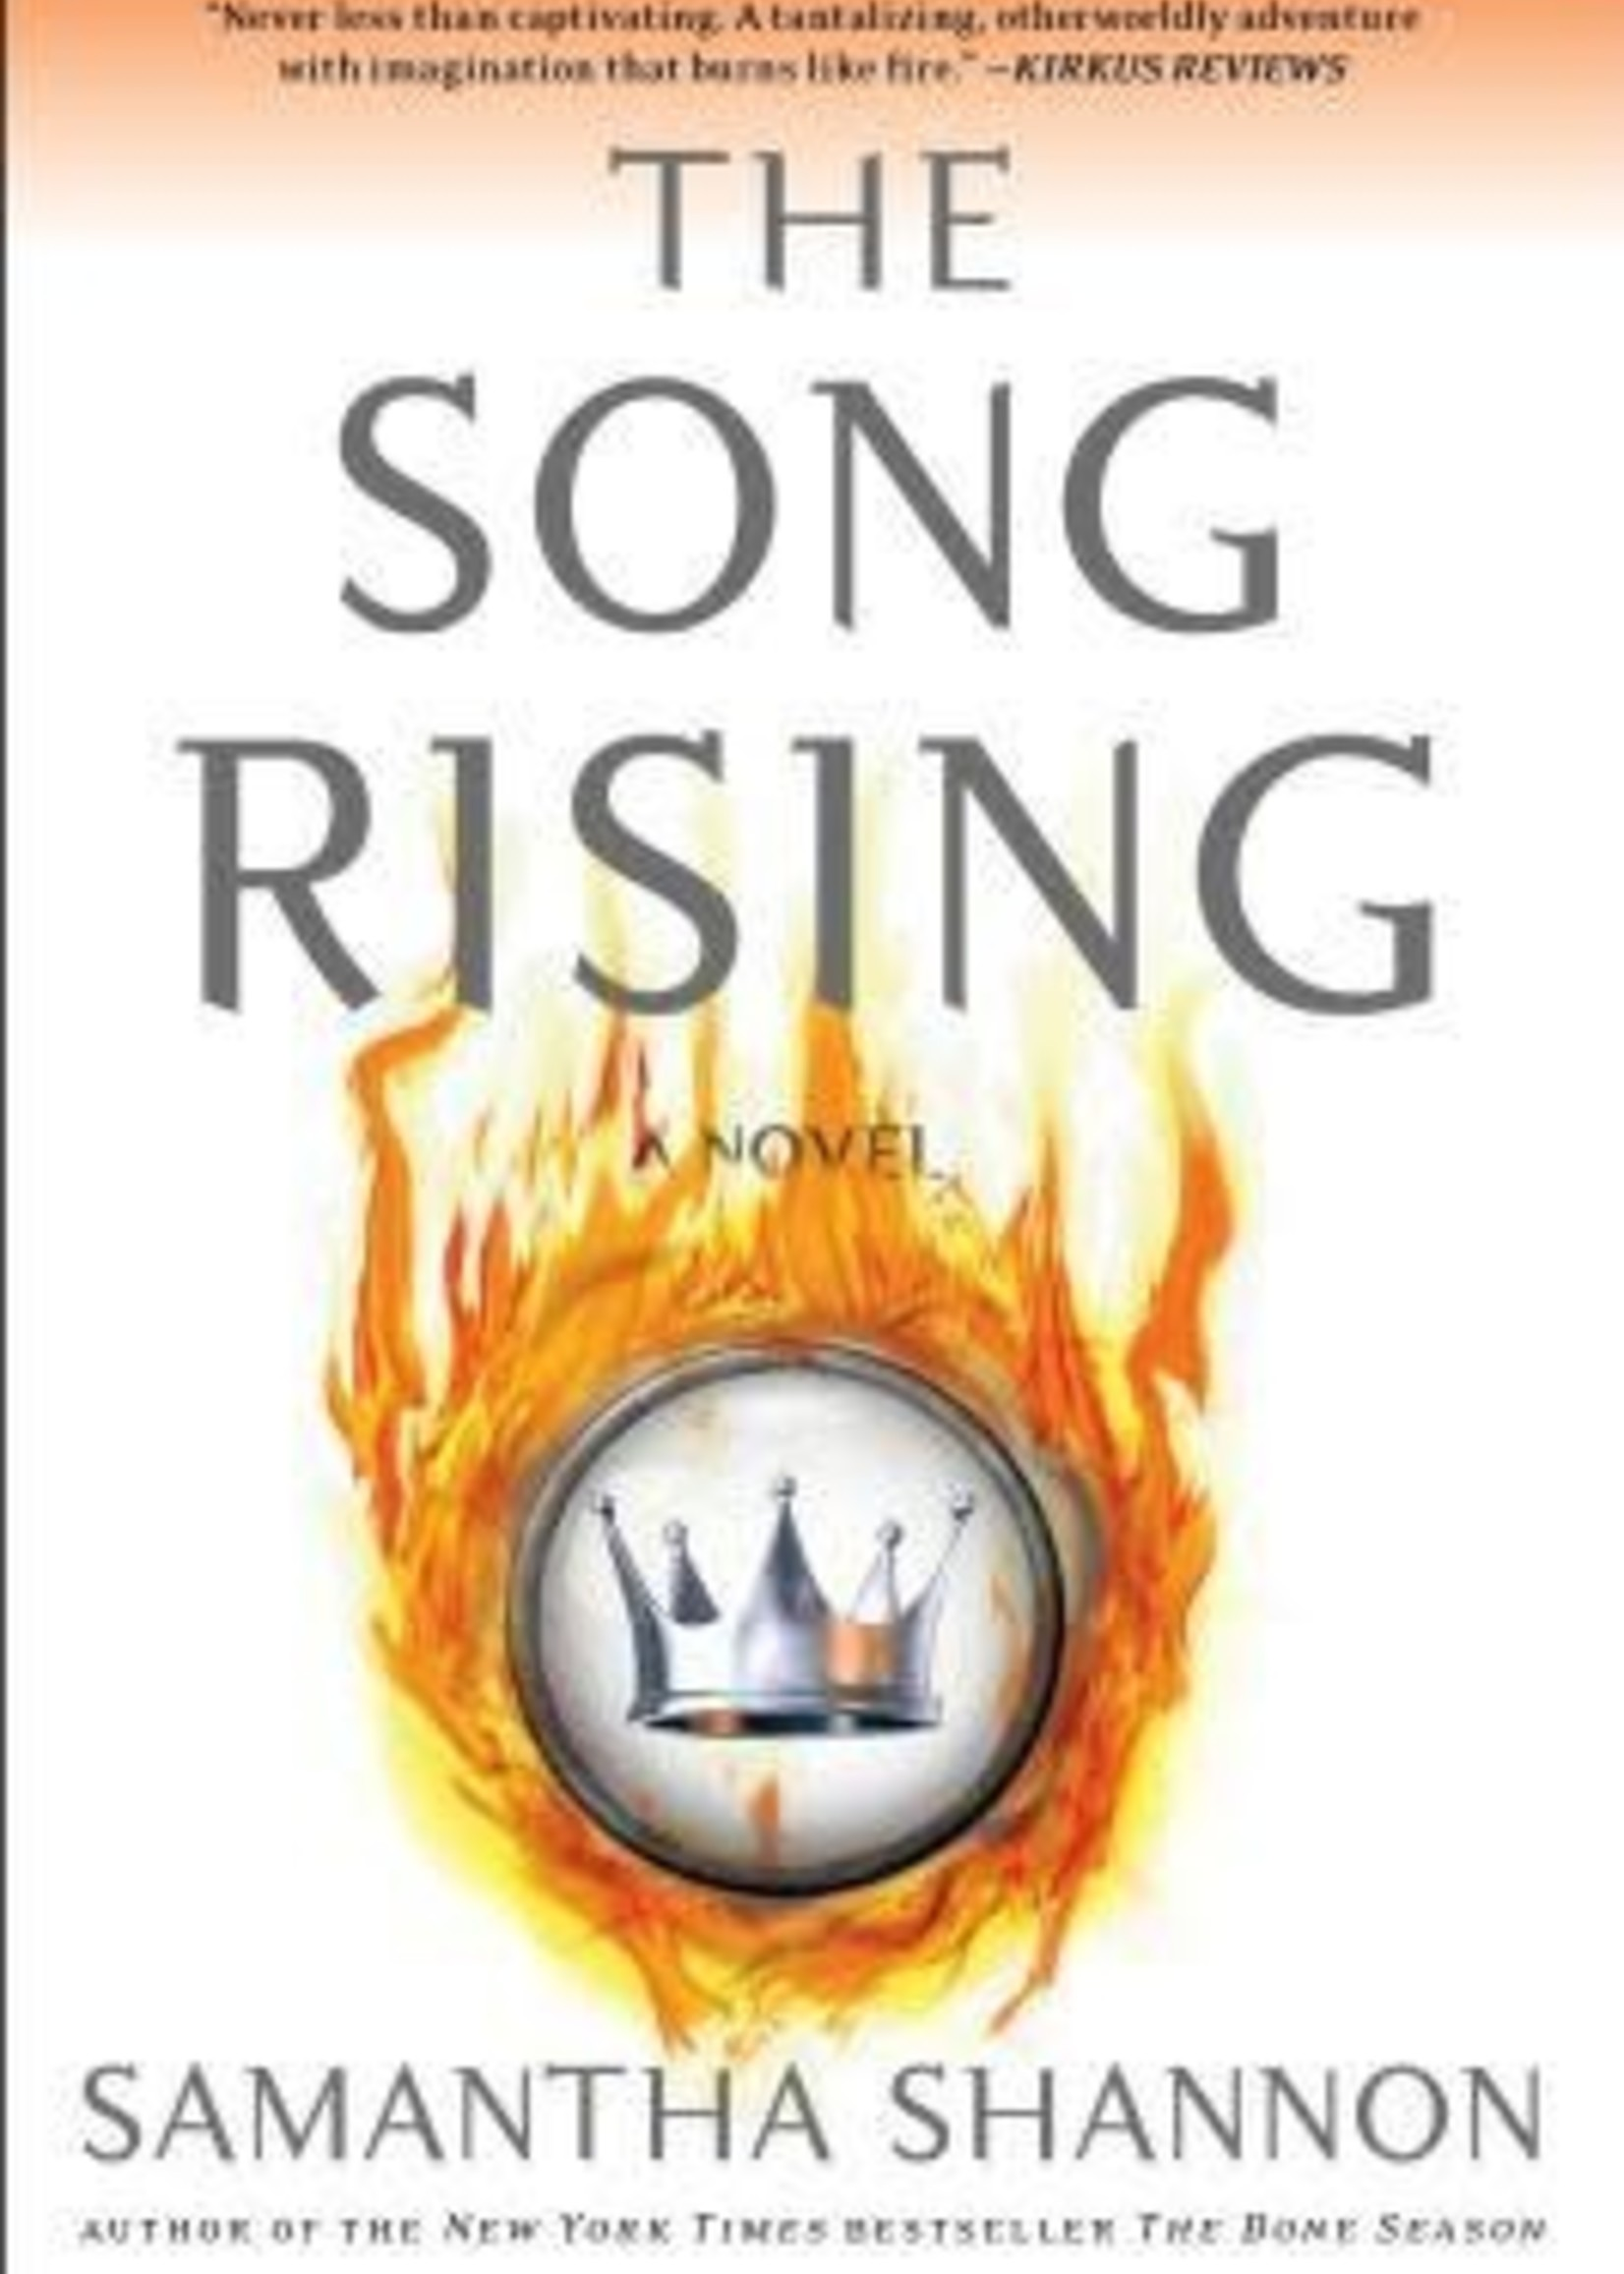 The Song Rising (The Bone Season #3) by Samantha Shannon